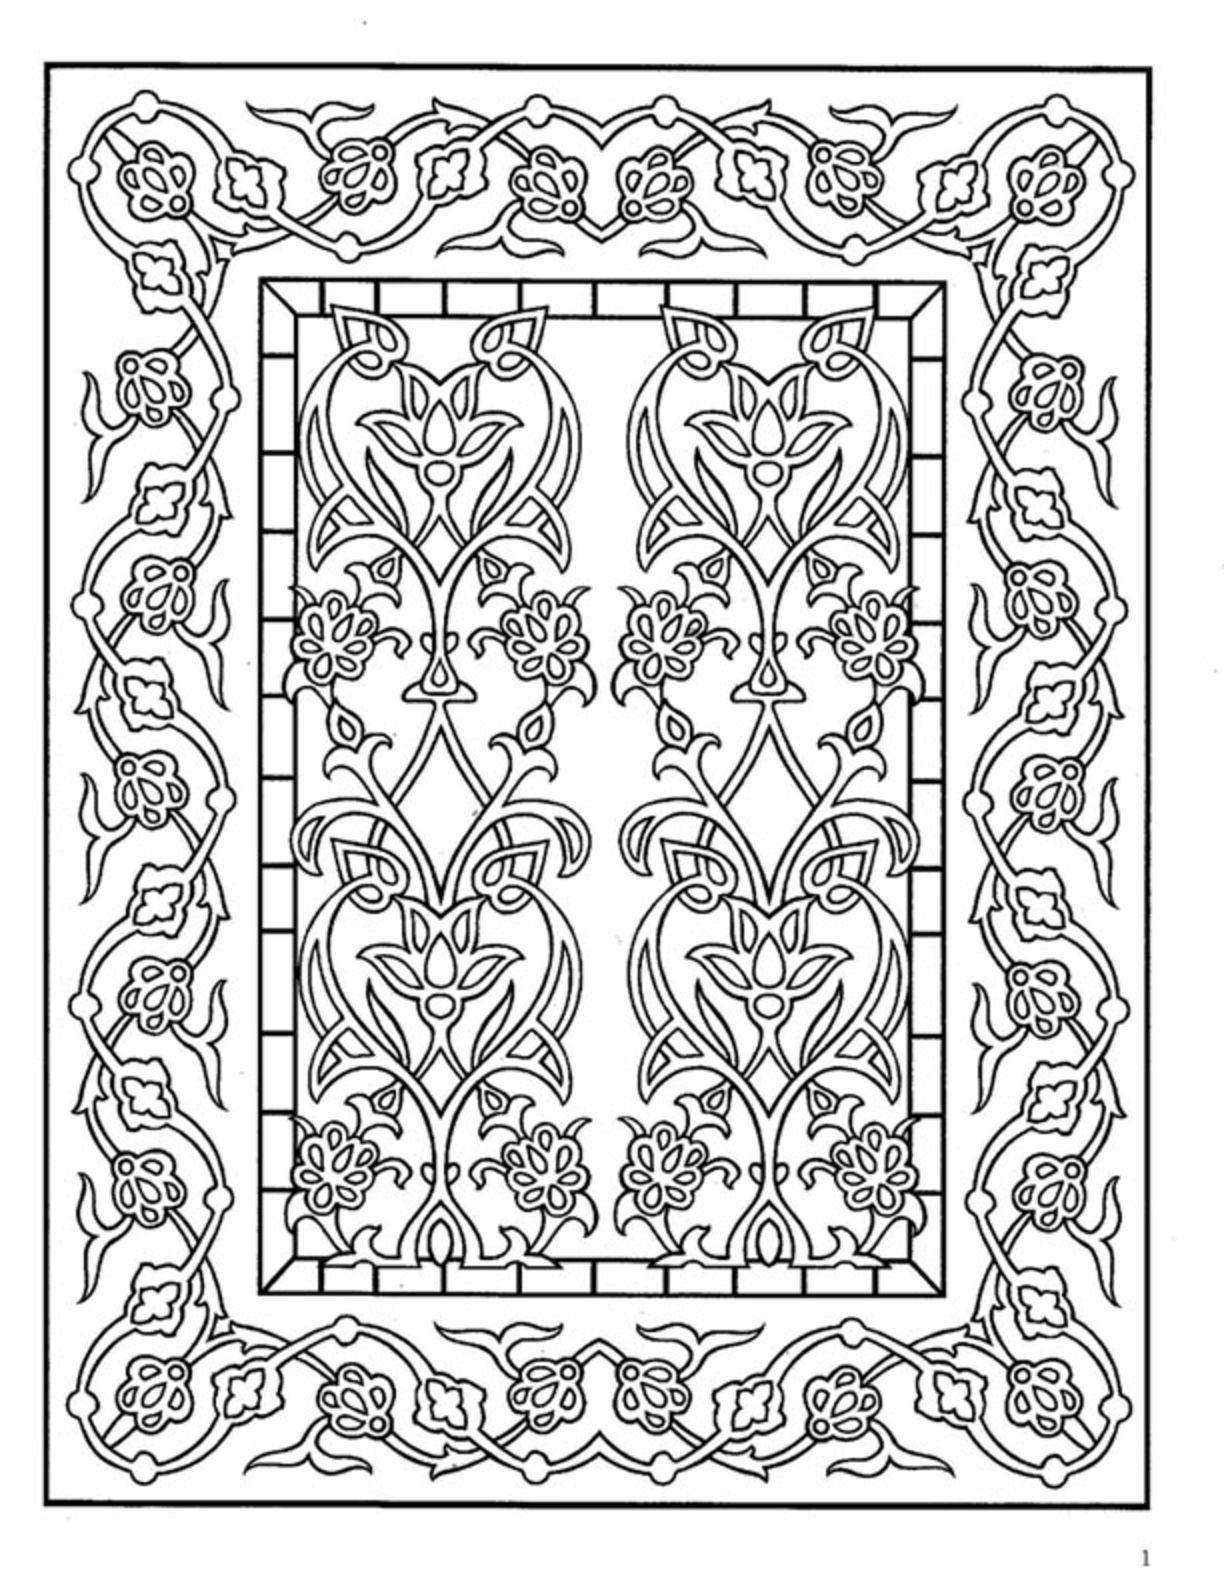 Dover Publications - Decorative Tile Designs Coloring Book